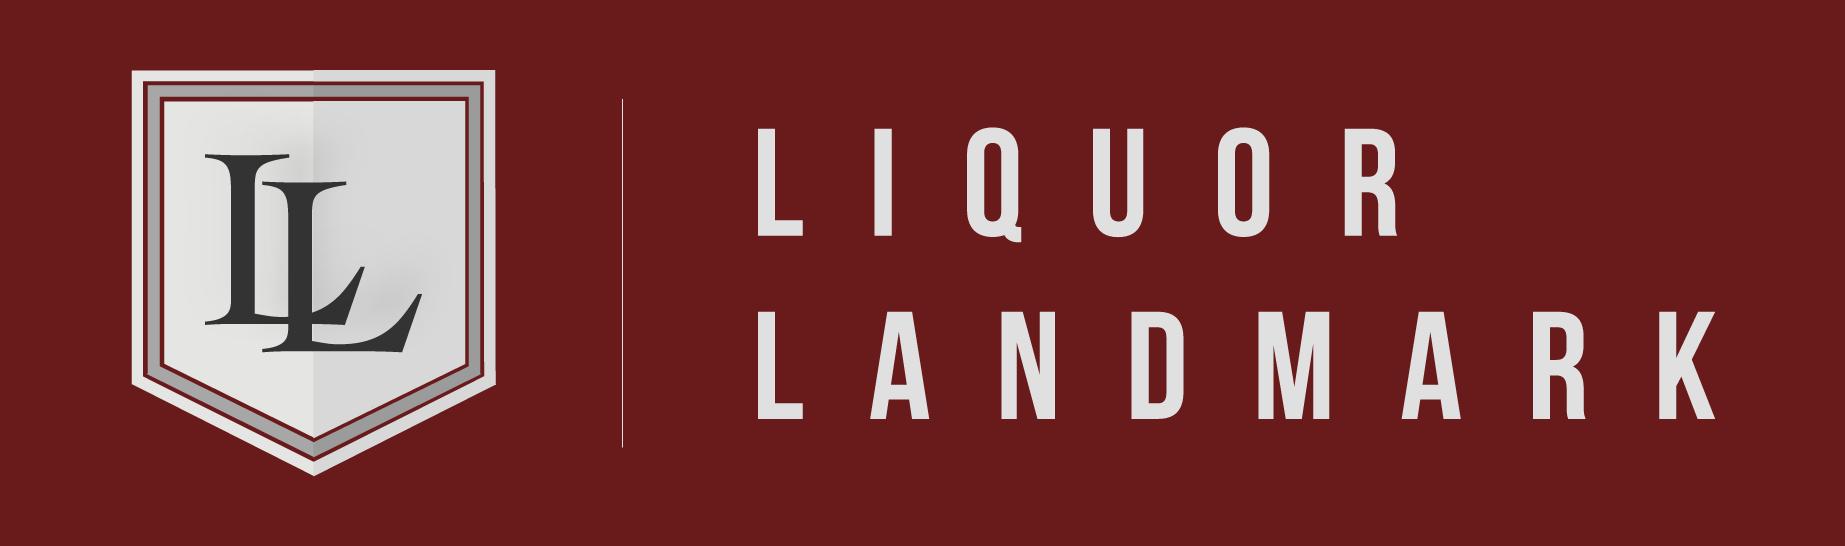 Liquor Landmark logo